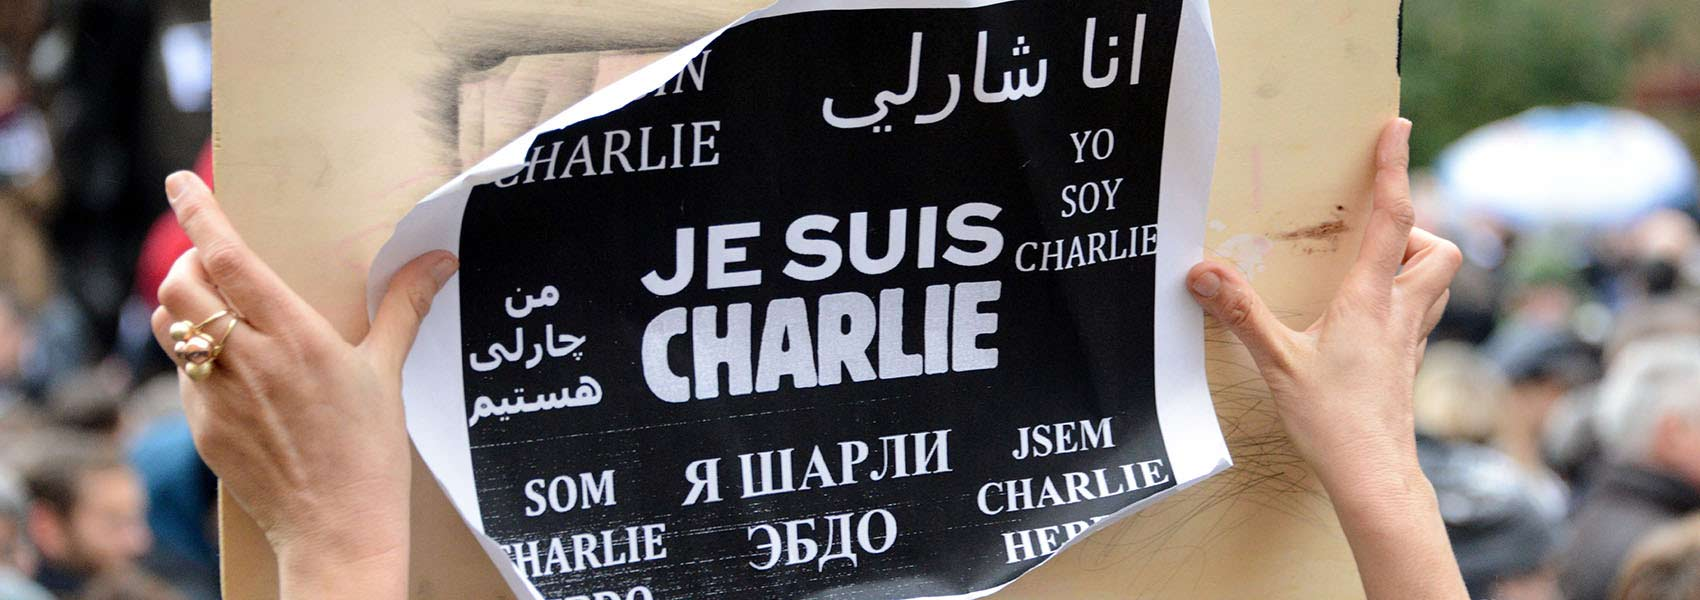 France: Extremism & Counter-Extremism | Counter Extremism